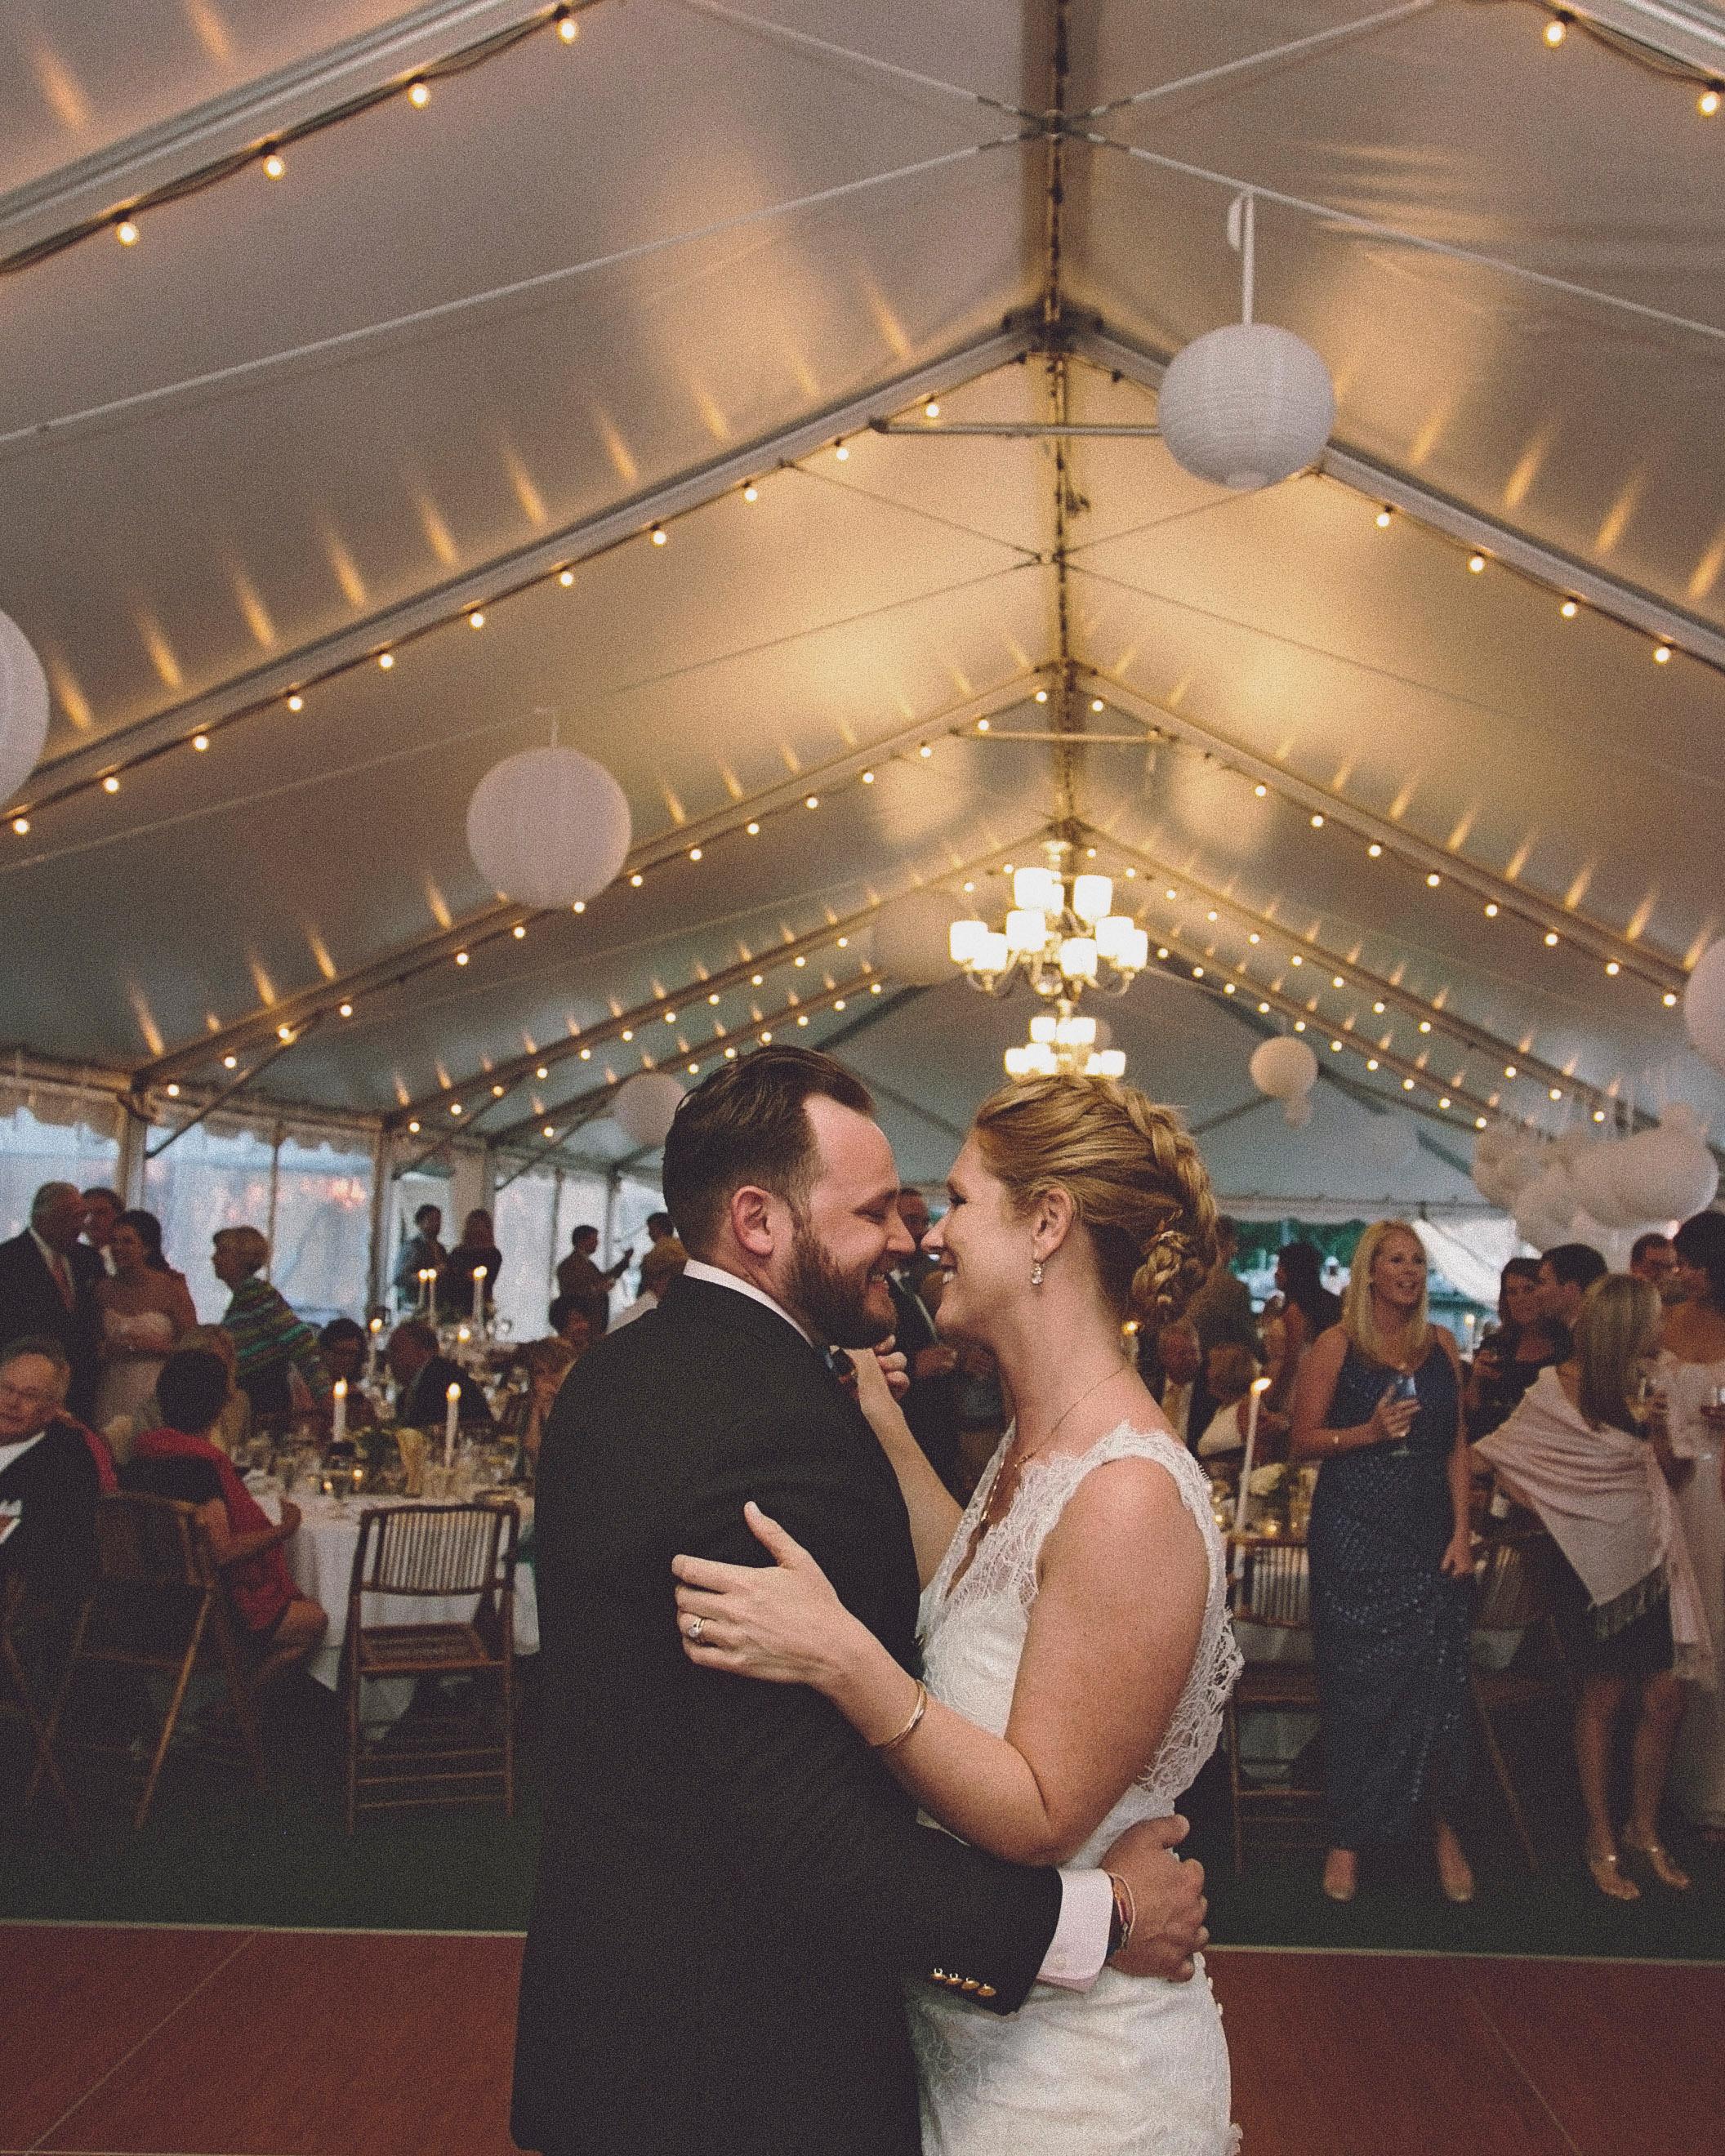 molly-greg-wedding-dance-00092-s111481-0814.jpg